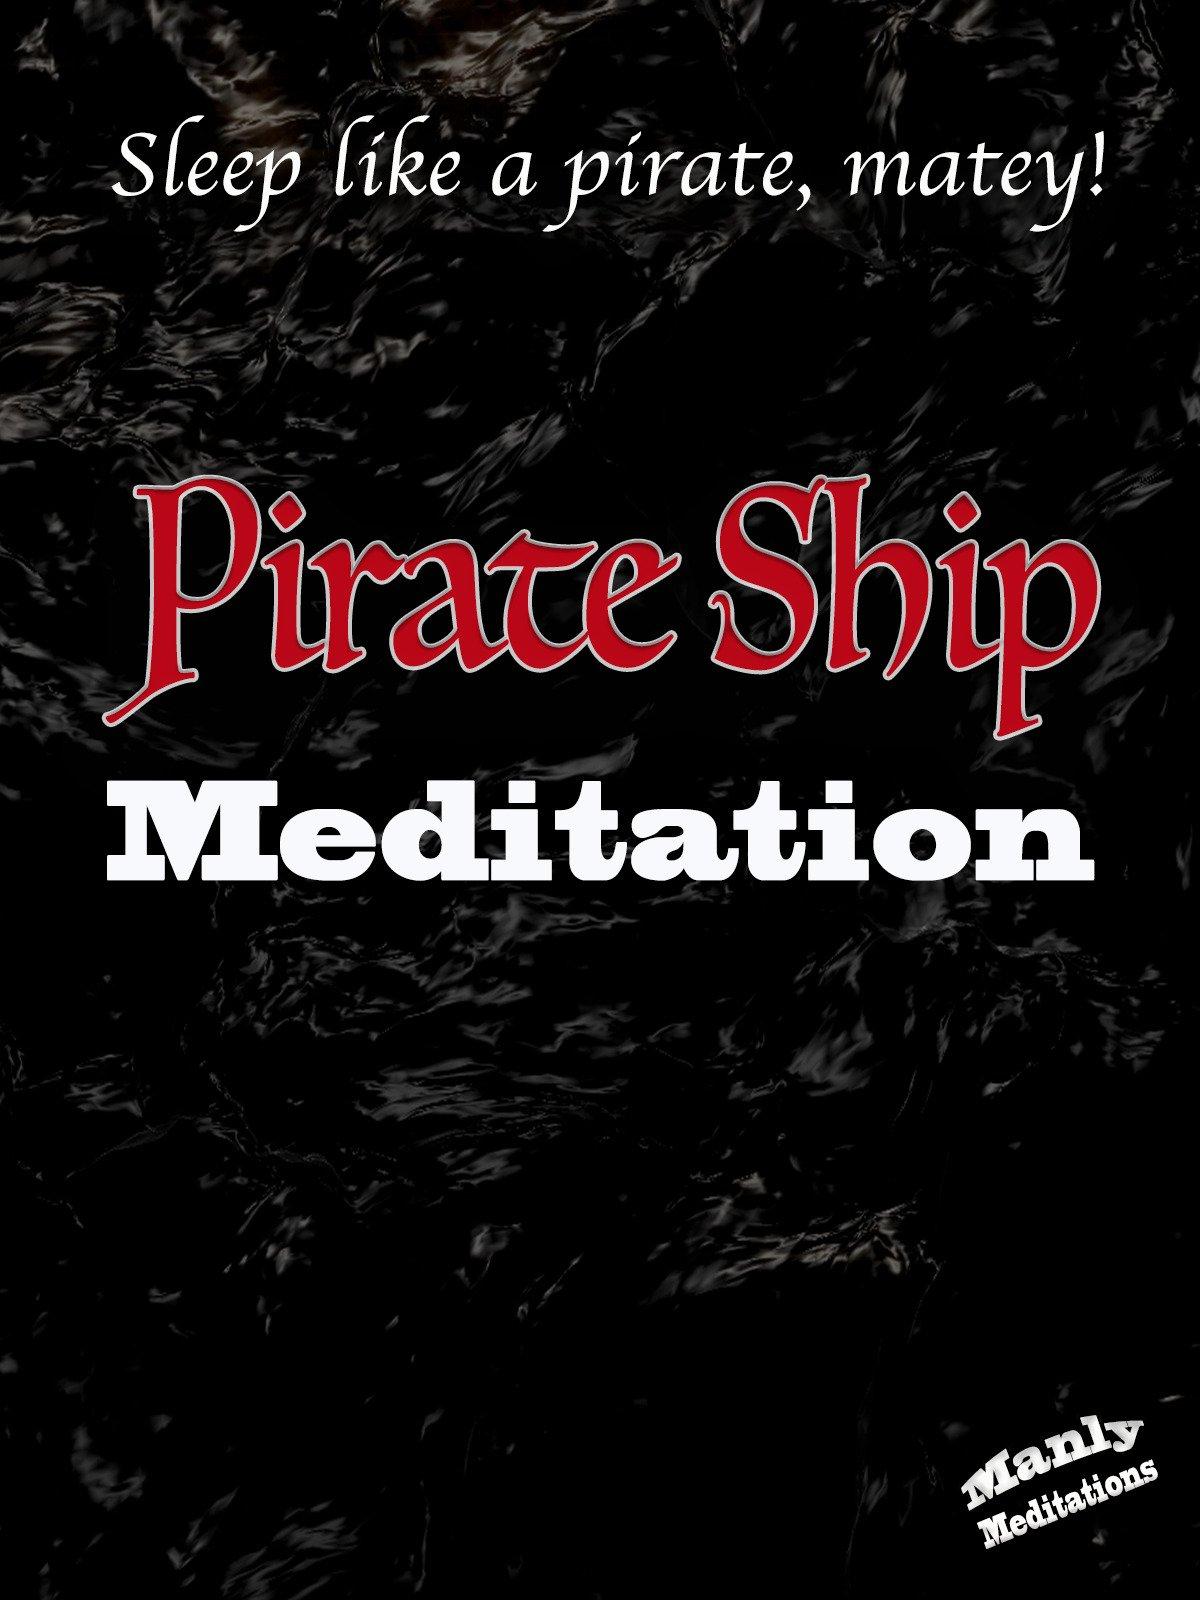 Pirate Ship Meditation